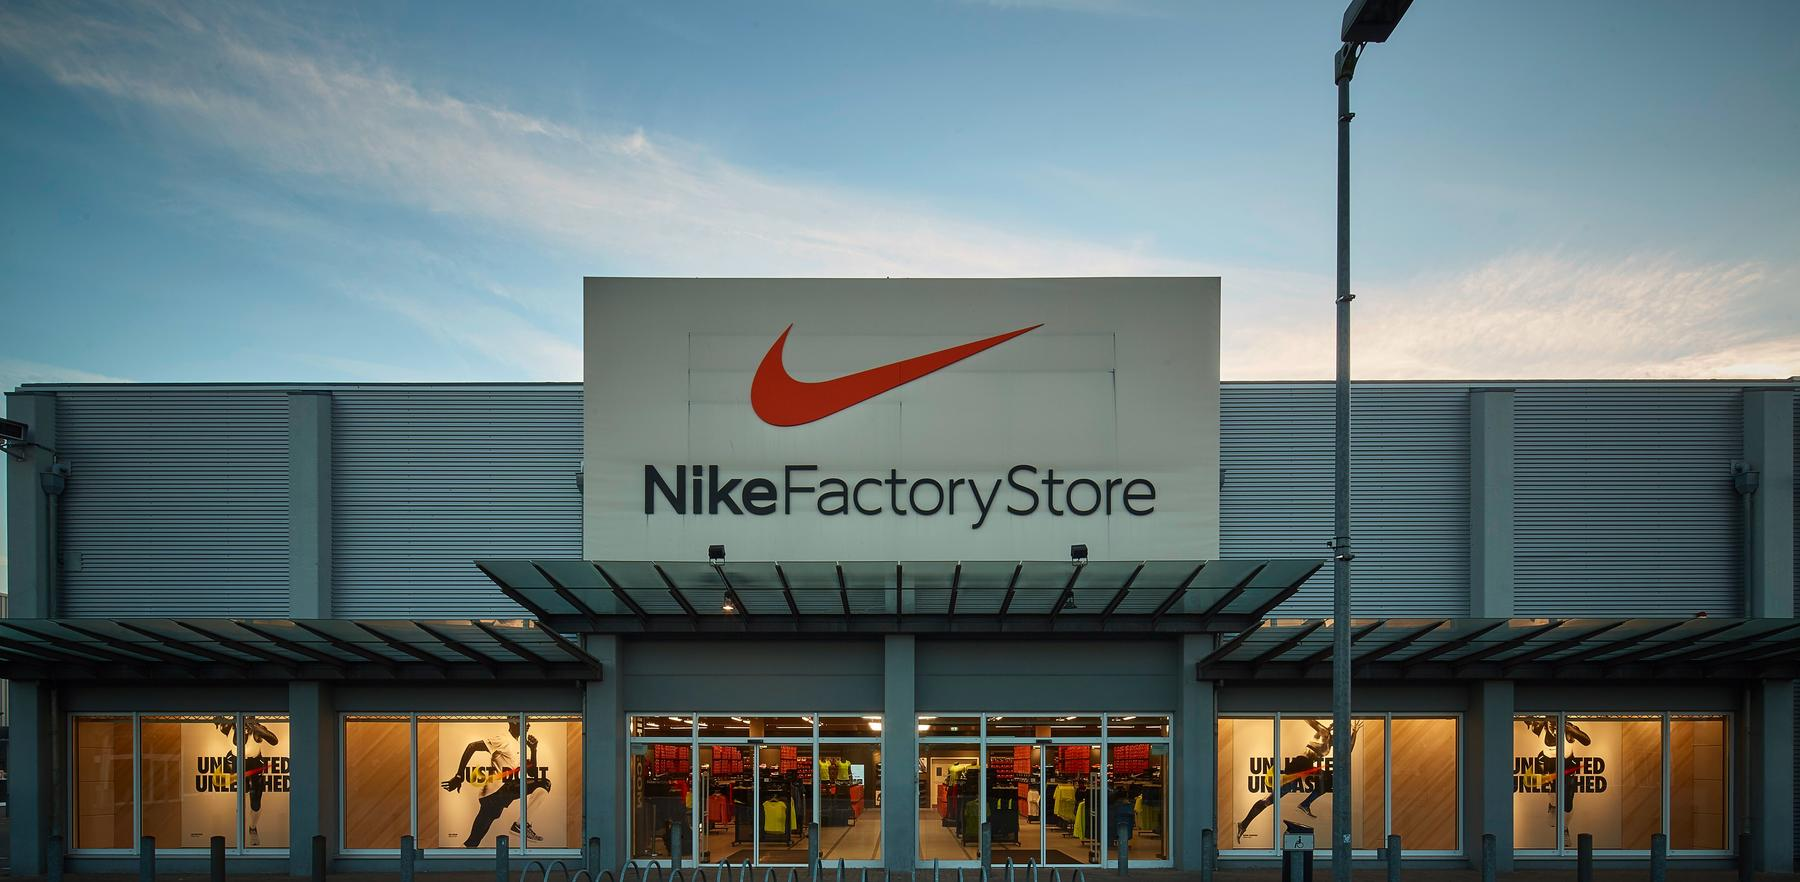 b10b3add71b Nike Factory Store Bremen - Stuhr NI